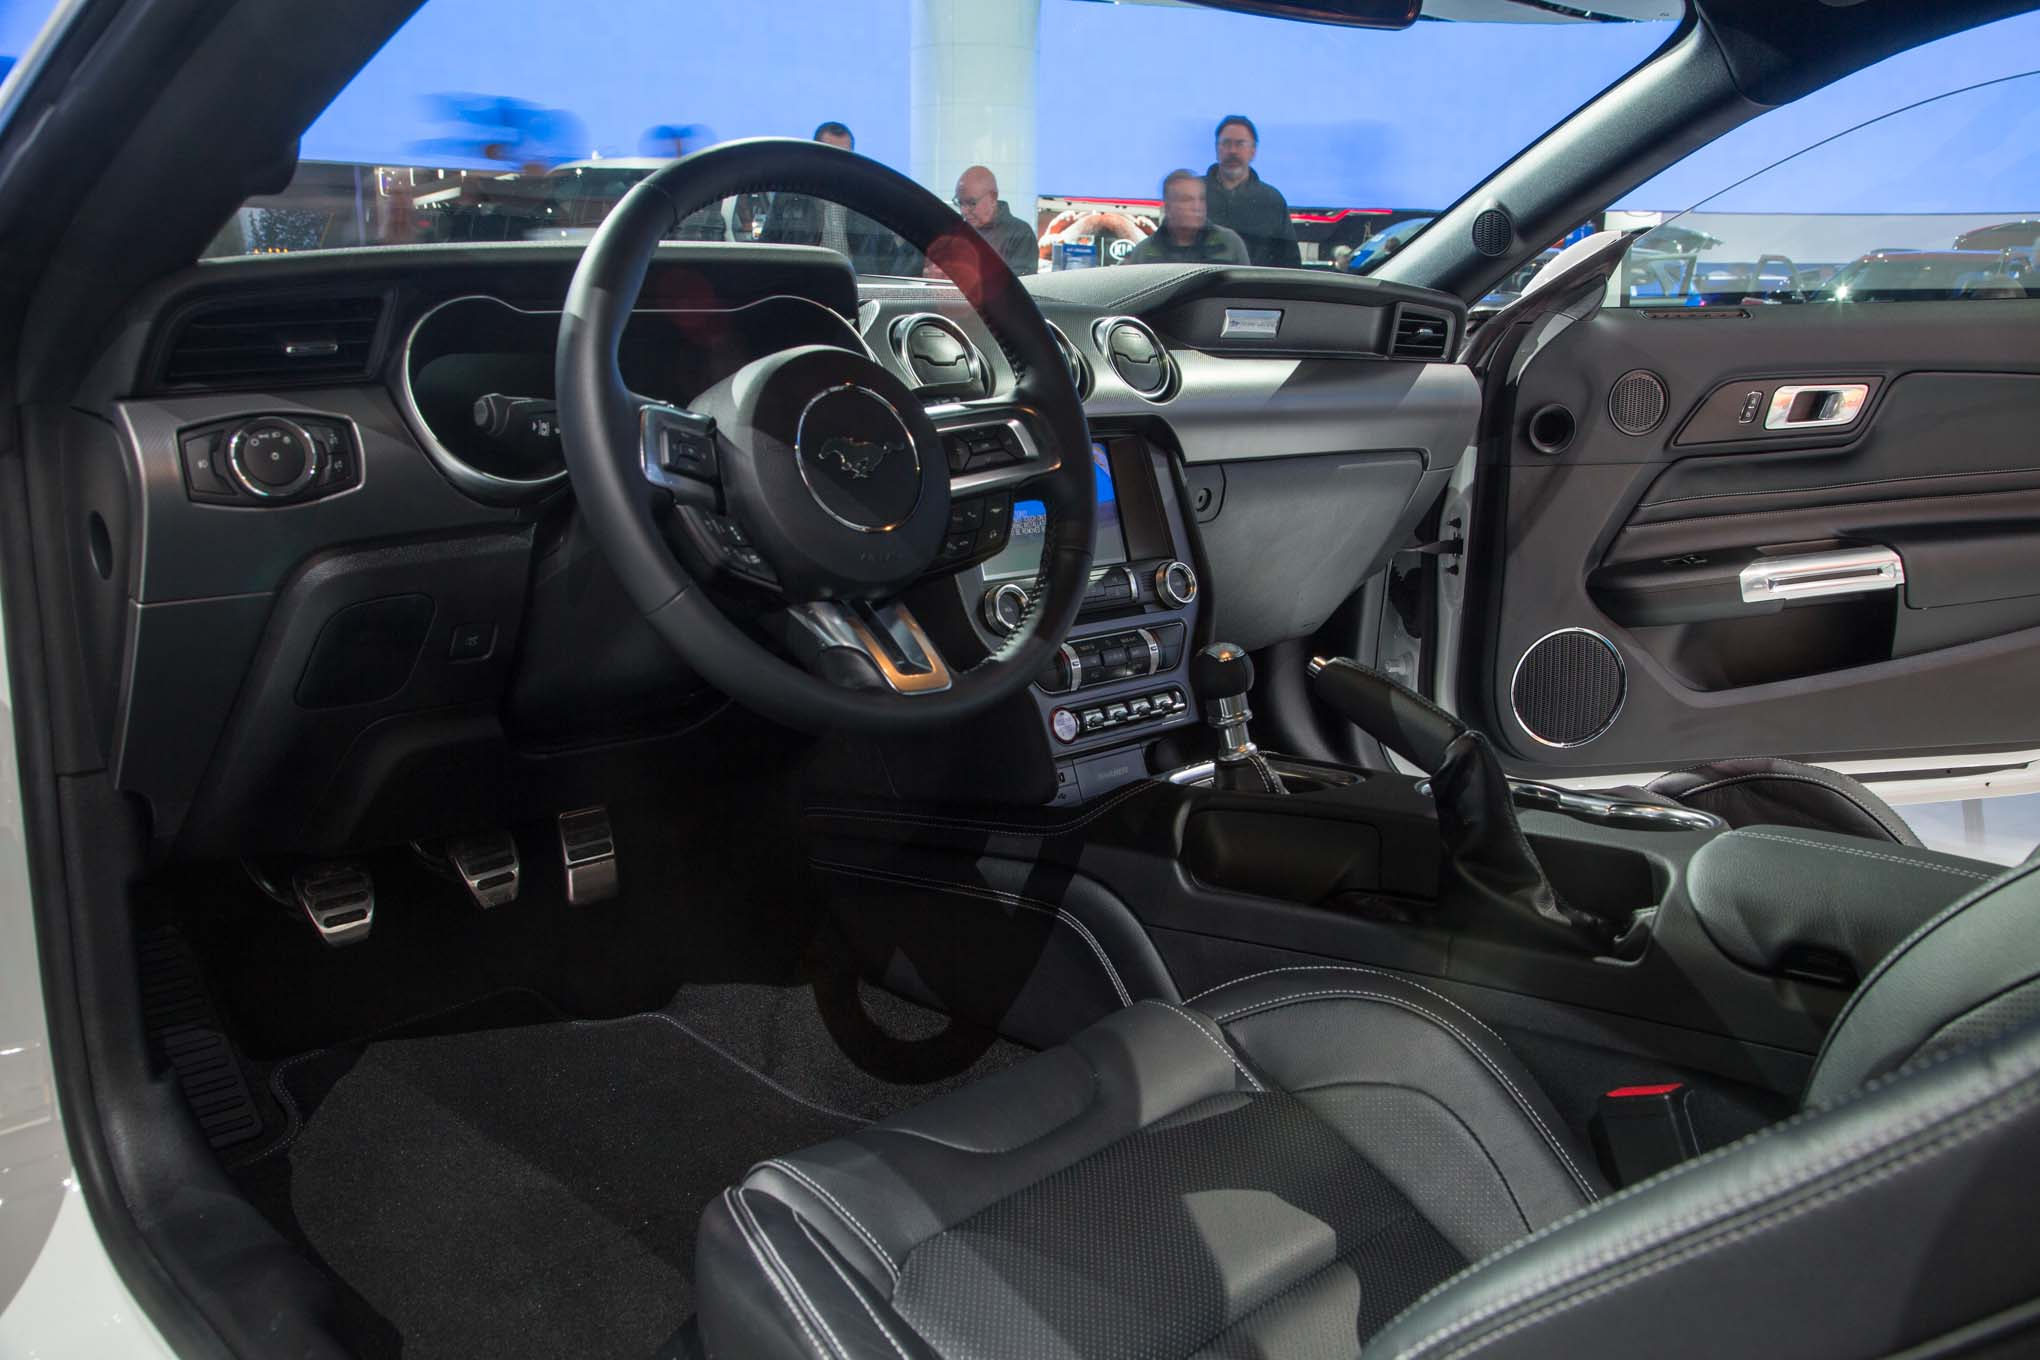 2018 ford mustang gt interior 1